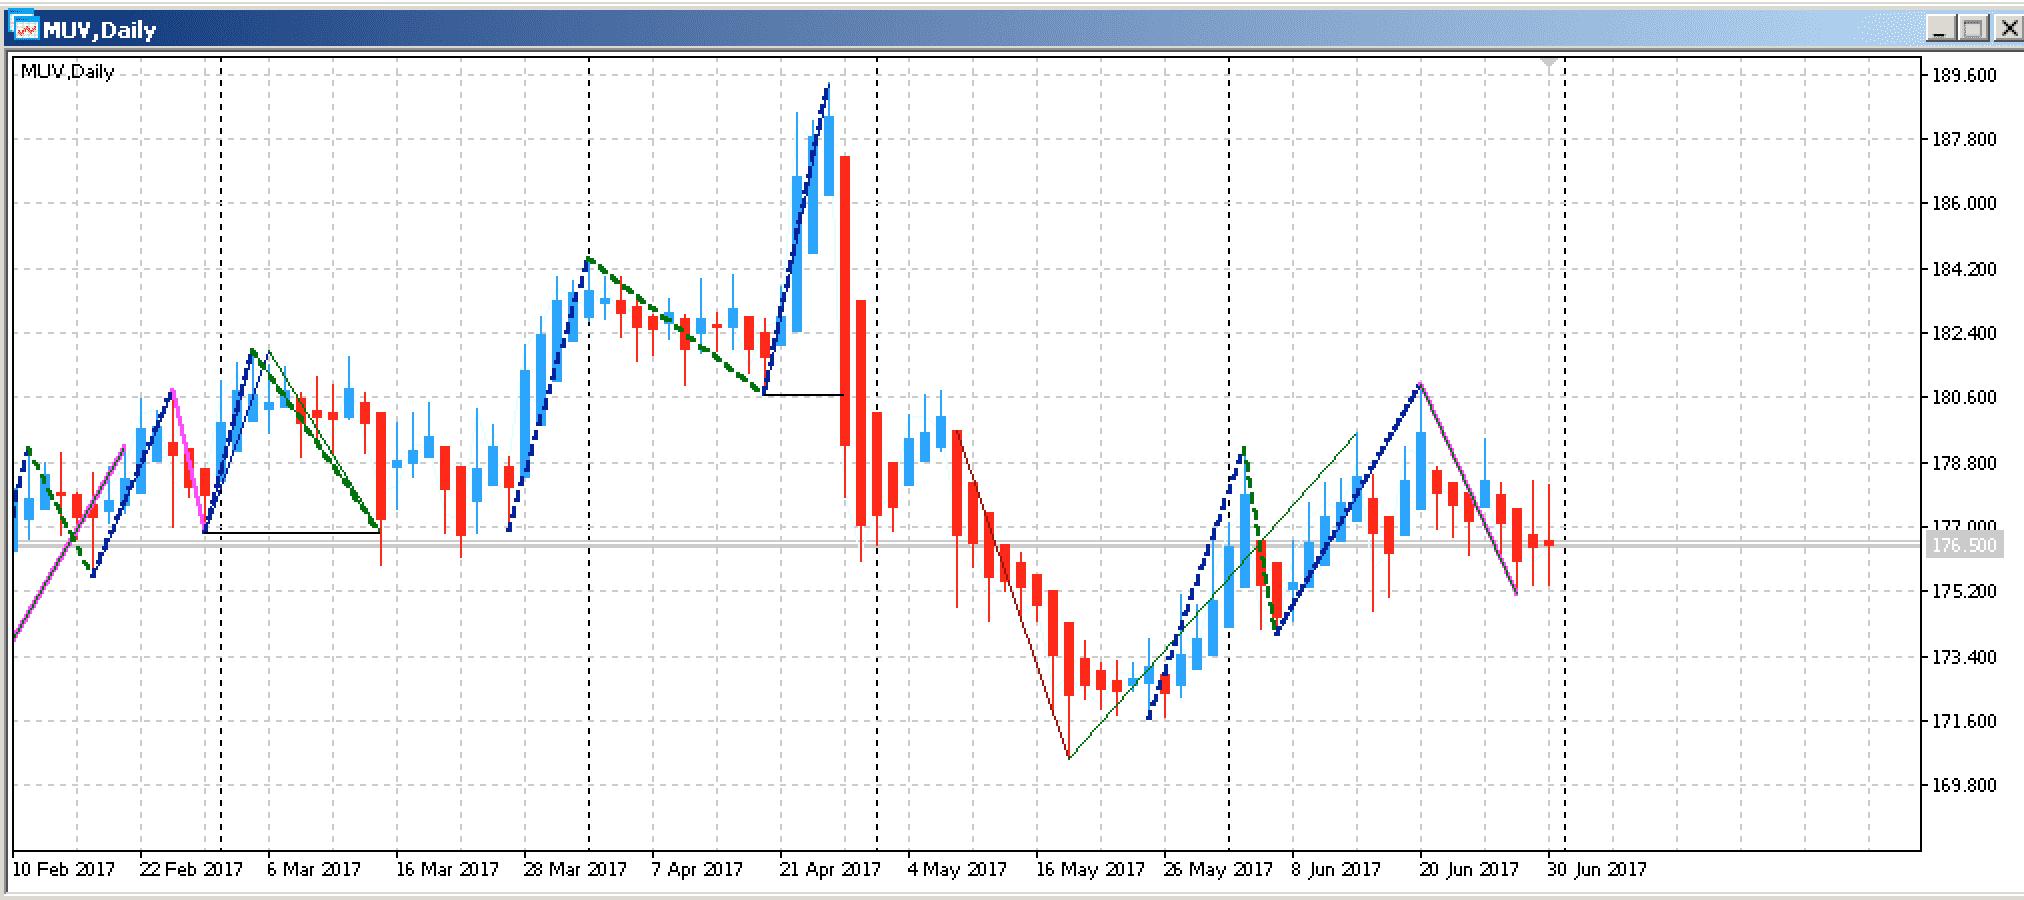 Top Edge-Aktien KW 27 2017